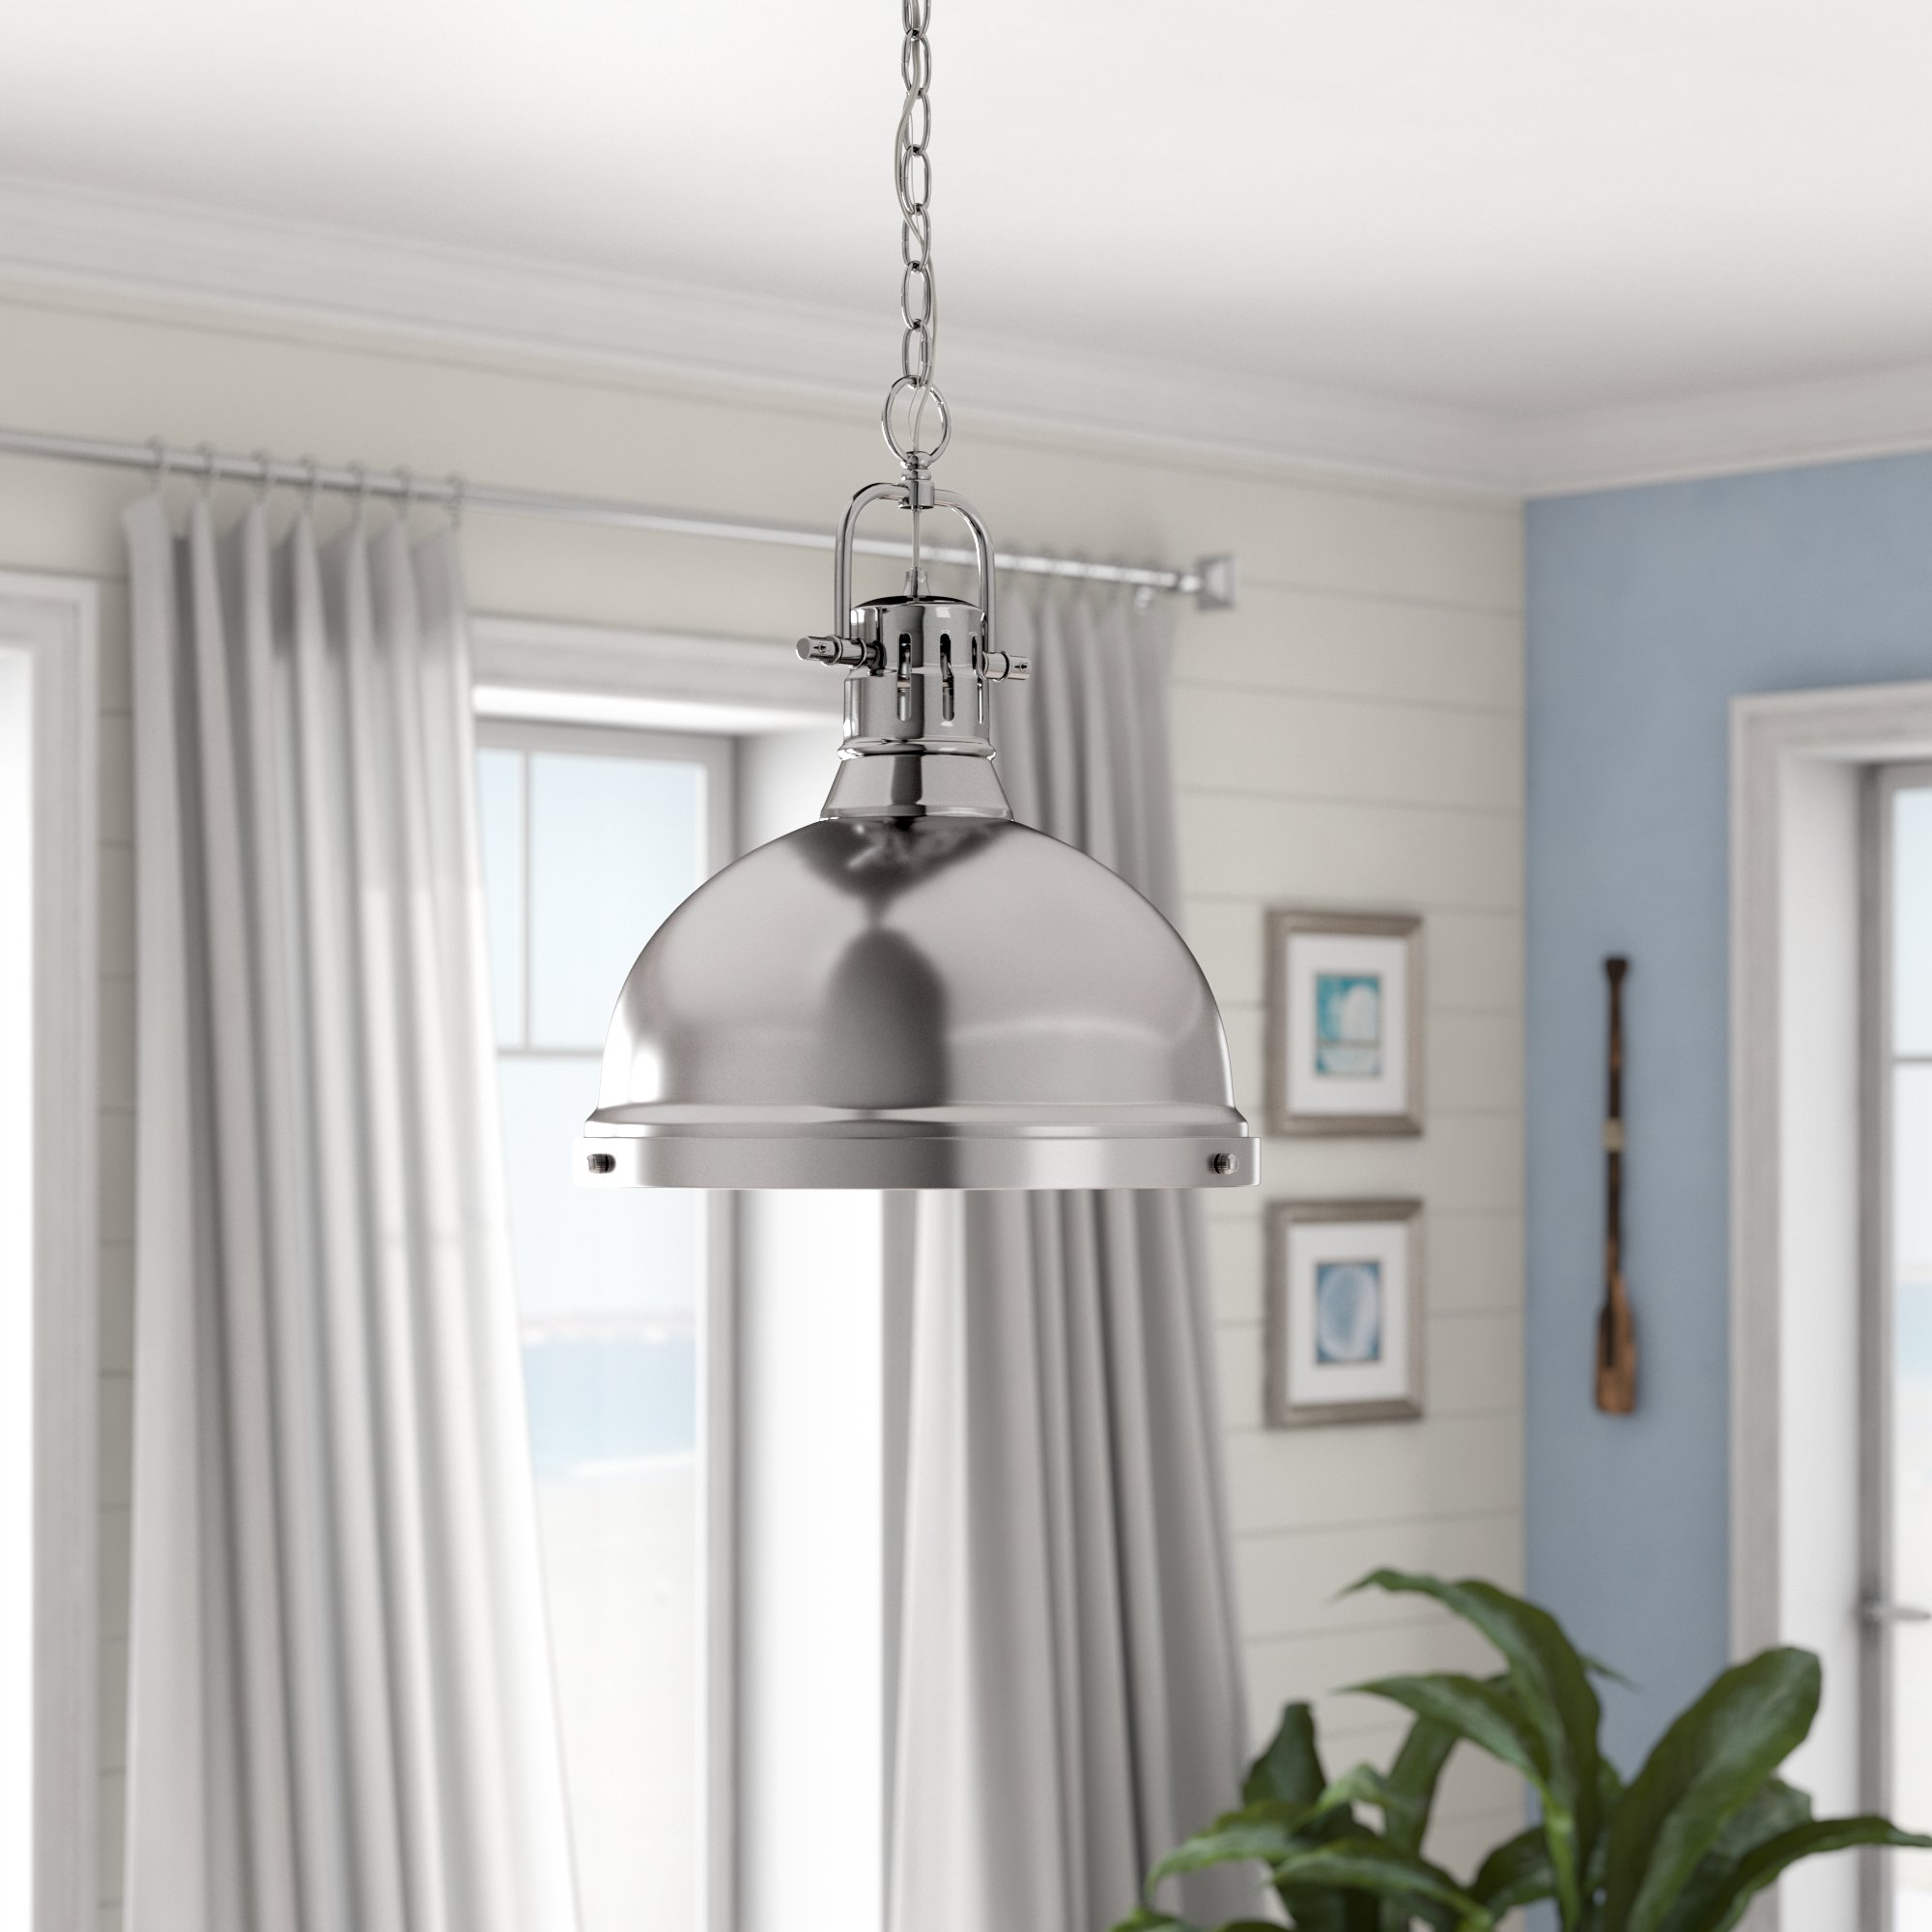 Bodalla 1 Light Single Bell Pendants With Newest Bodalla 1 Light Single Dome Pendant (View 8 of 20)